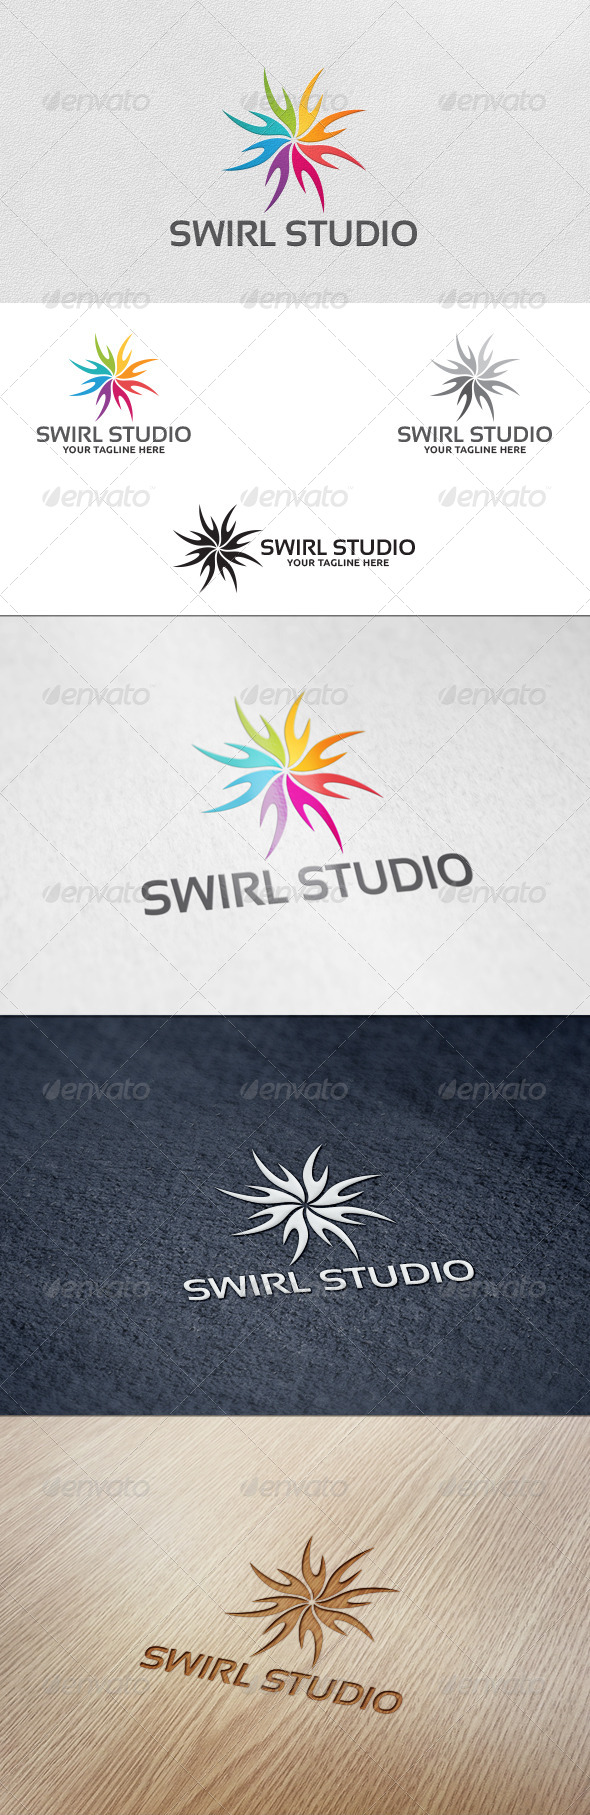 Swirl Studio Logo Template